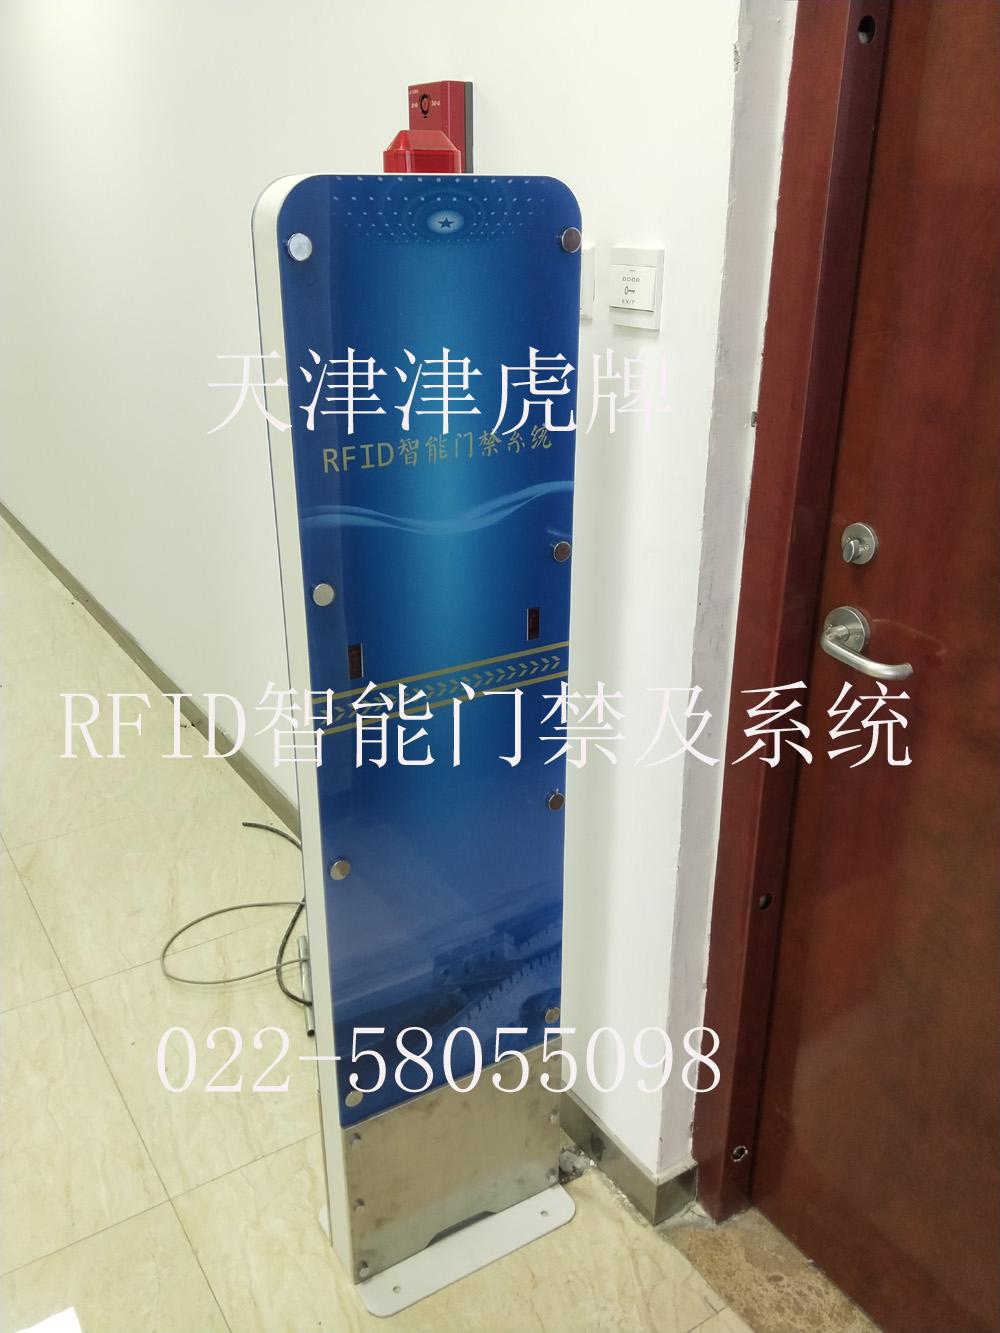 RFID超高频智能门禁,RFID系统